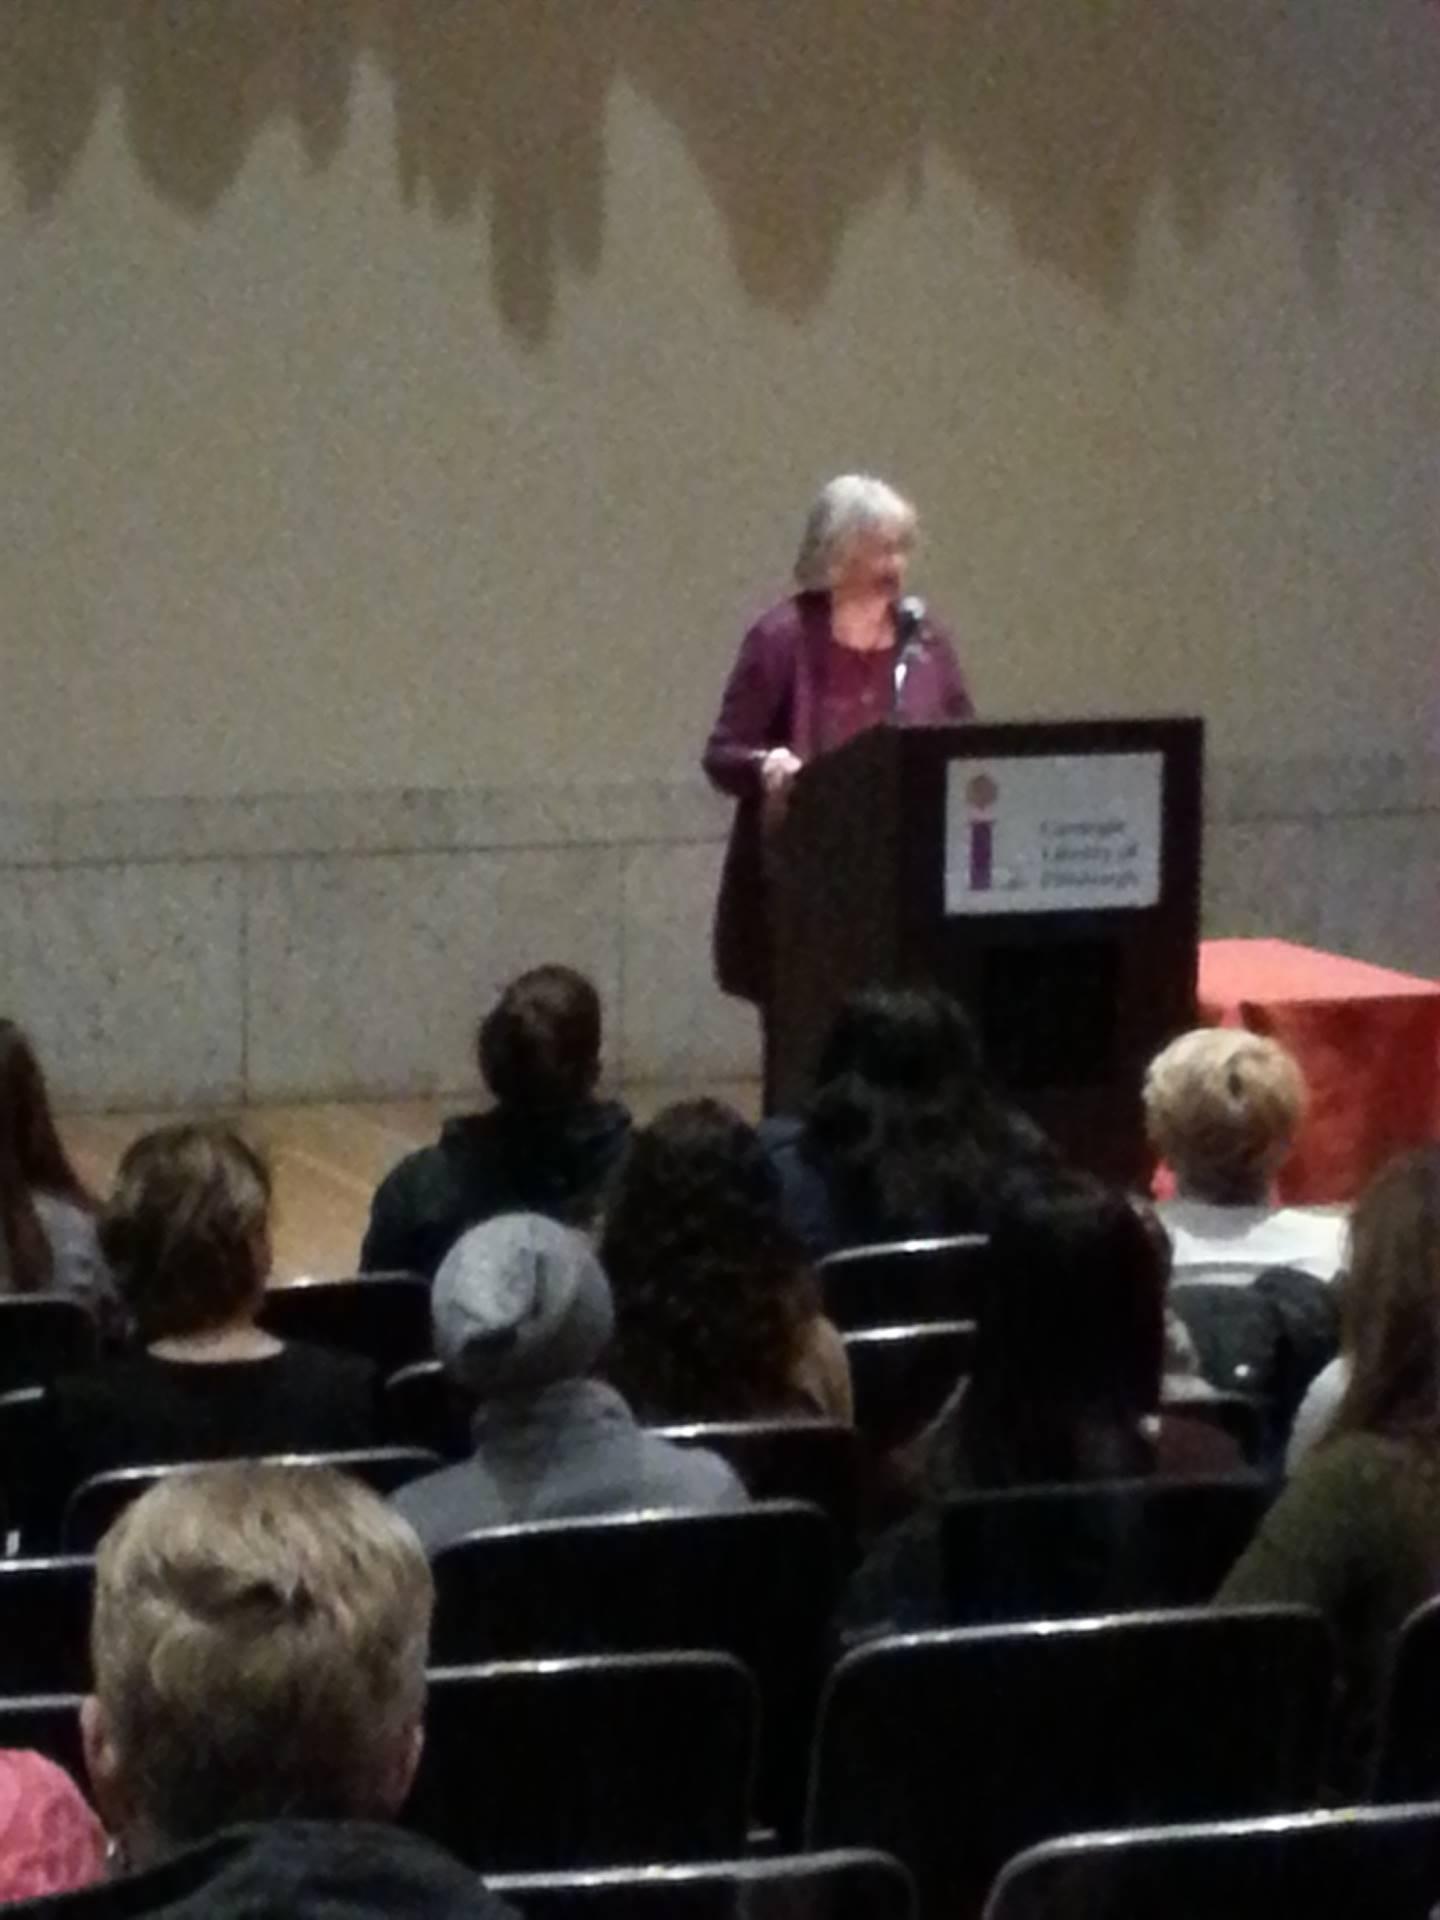 Katherine Paterson speaks at a podium.